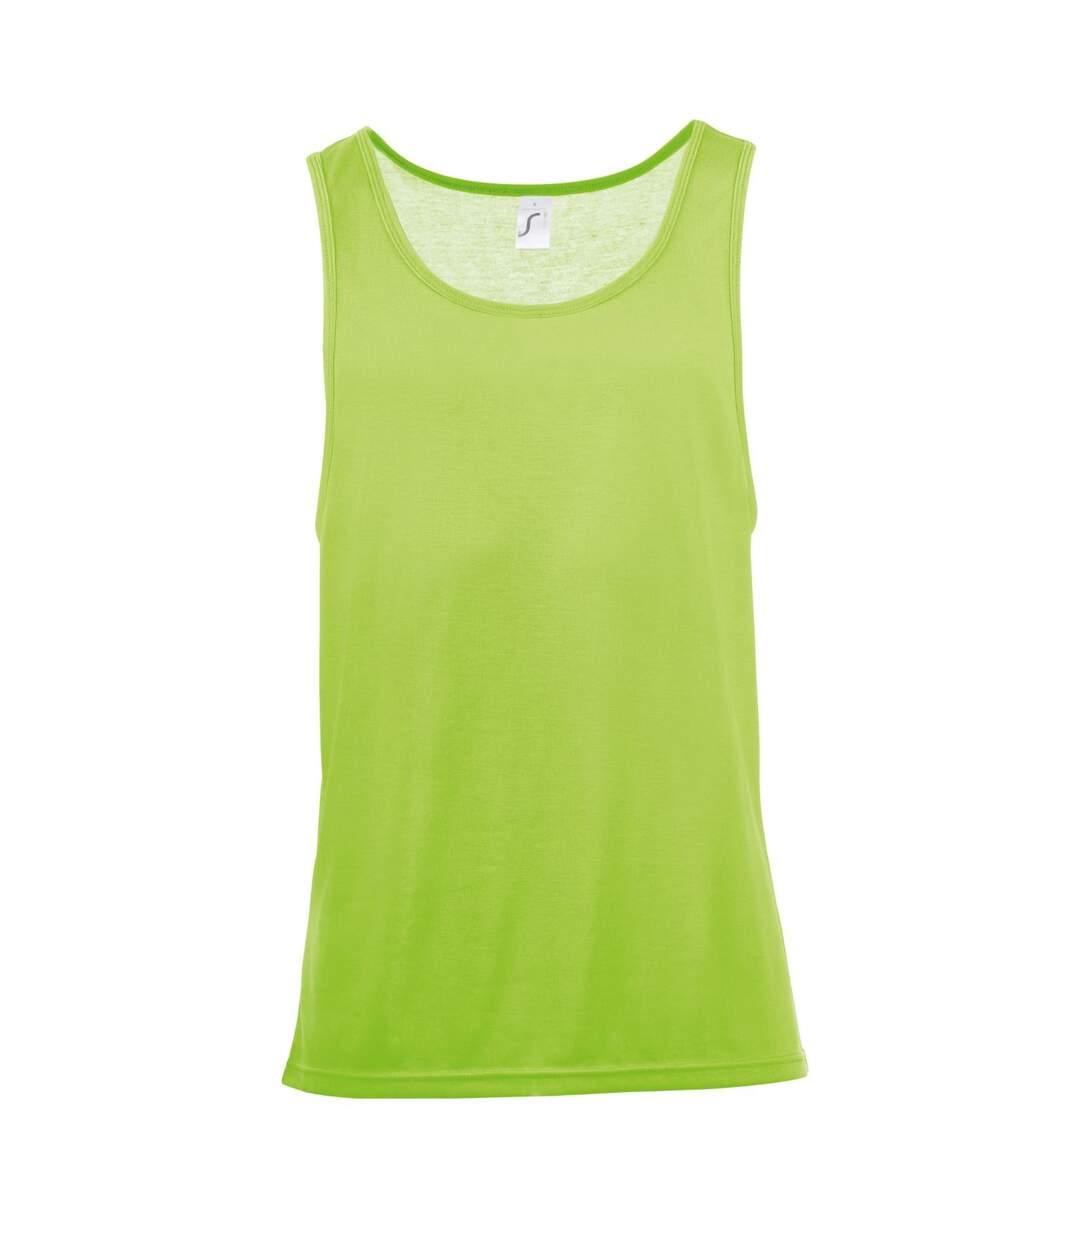 SOLS Unisex Jamaica Sleeveless Tank / Vest Top (Neon Orange) - UTPC2179